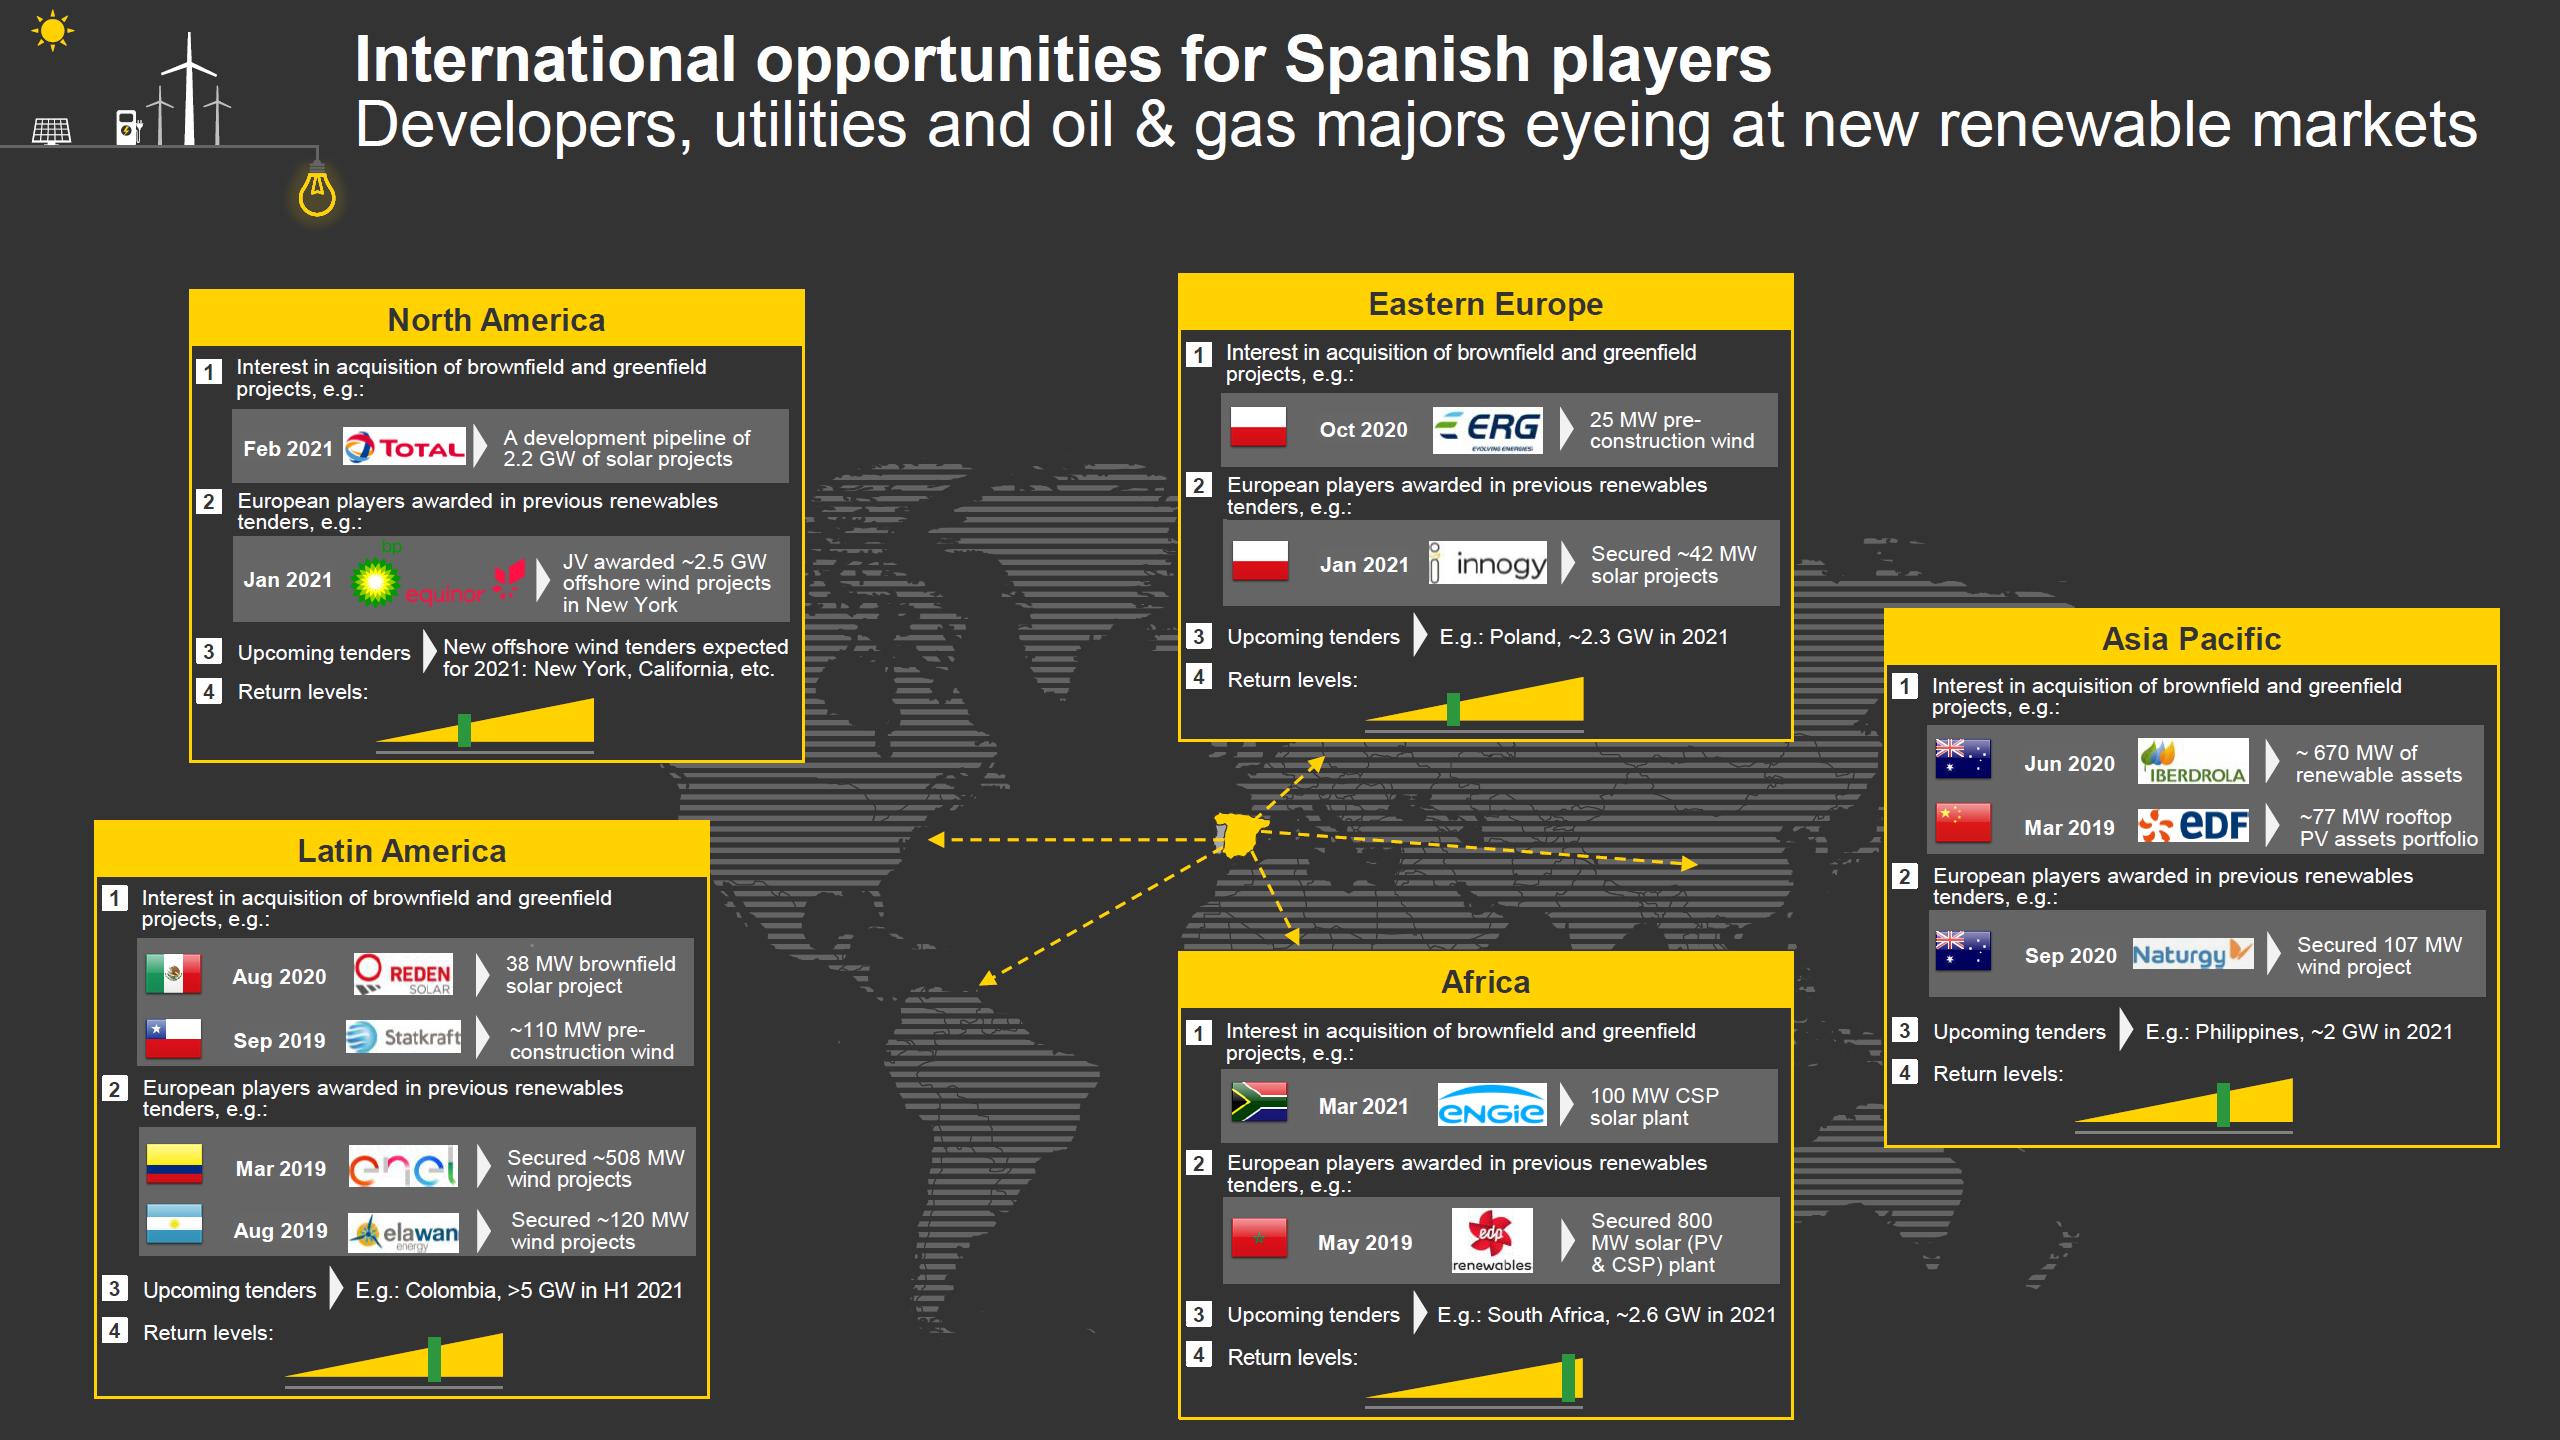 AleaSoft - EY International opportunities Spanish players renewable energies